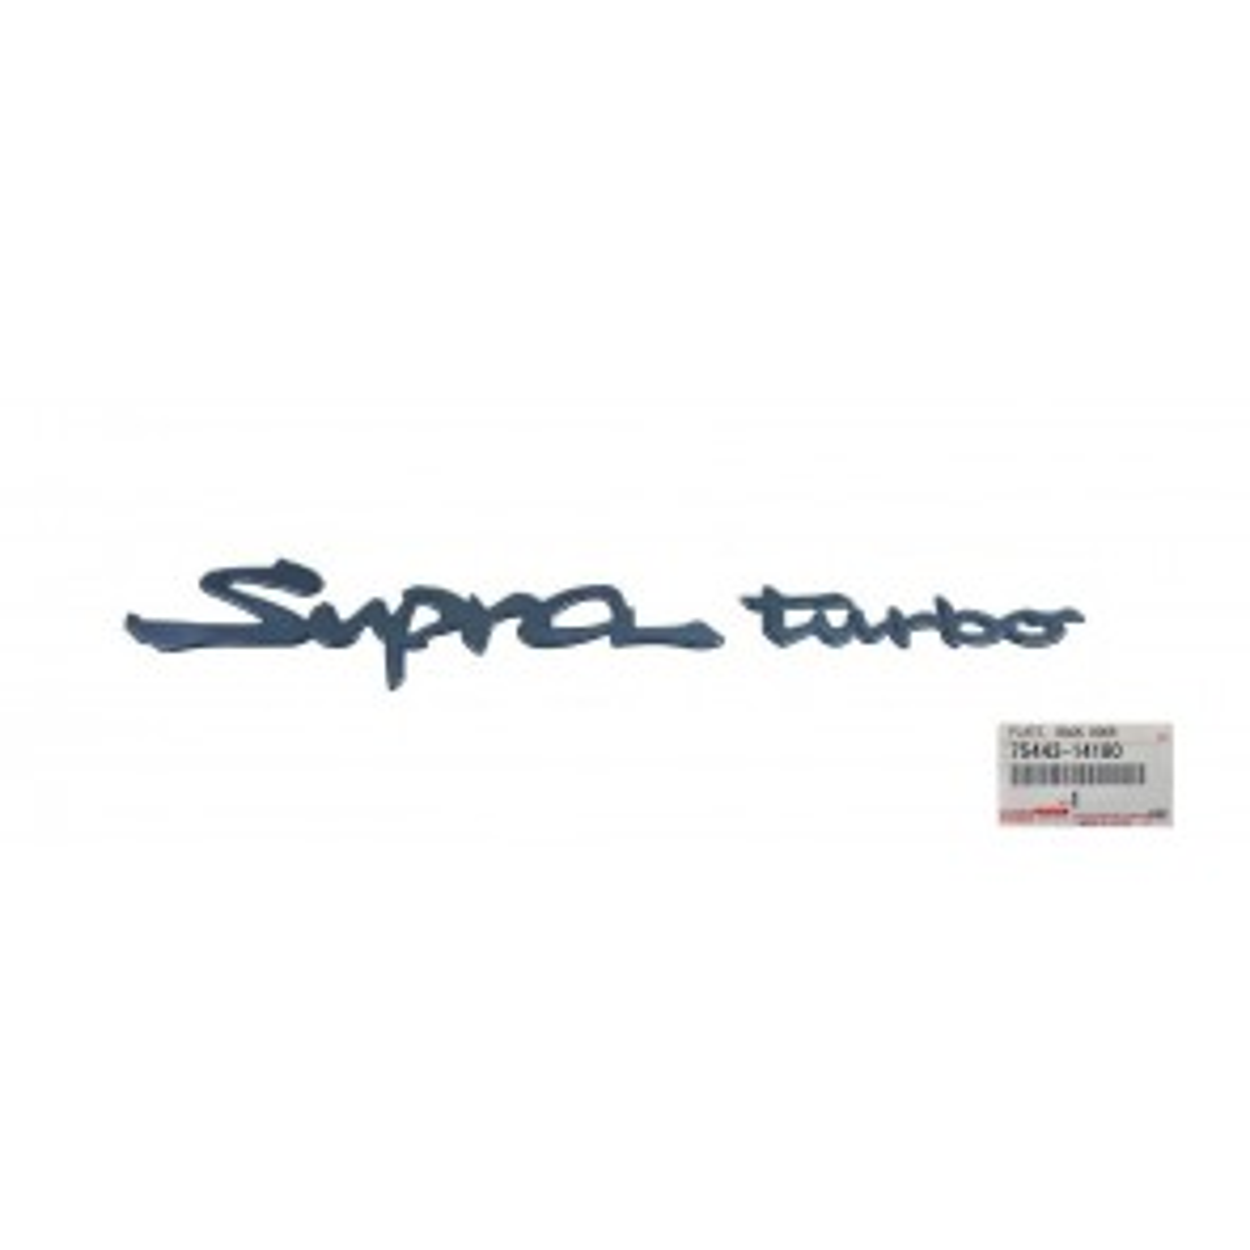 Rear Toyota 'Supra Turbo' Emblem Badge Fits Toyota Supra MK4 JZA80 75443-14180